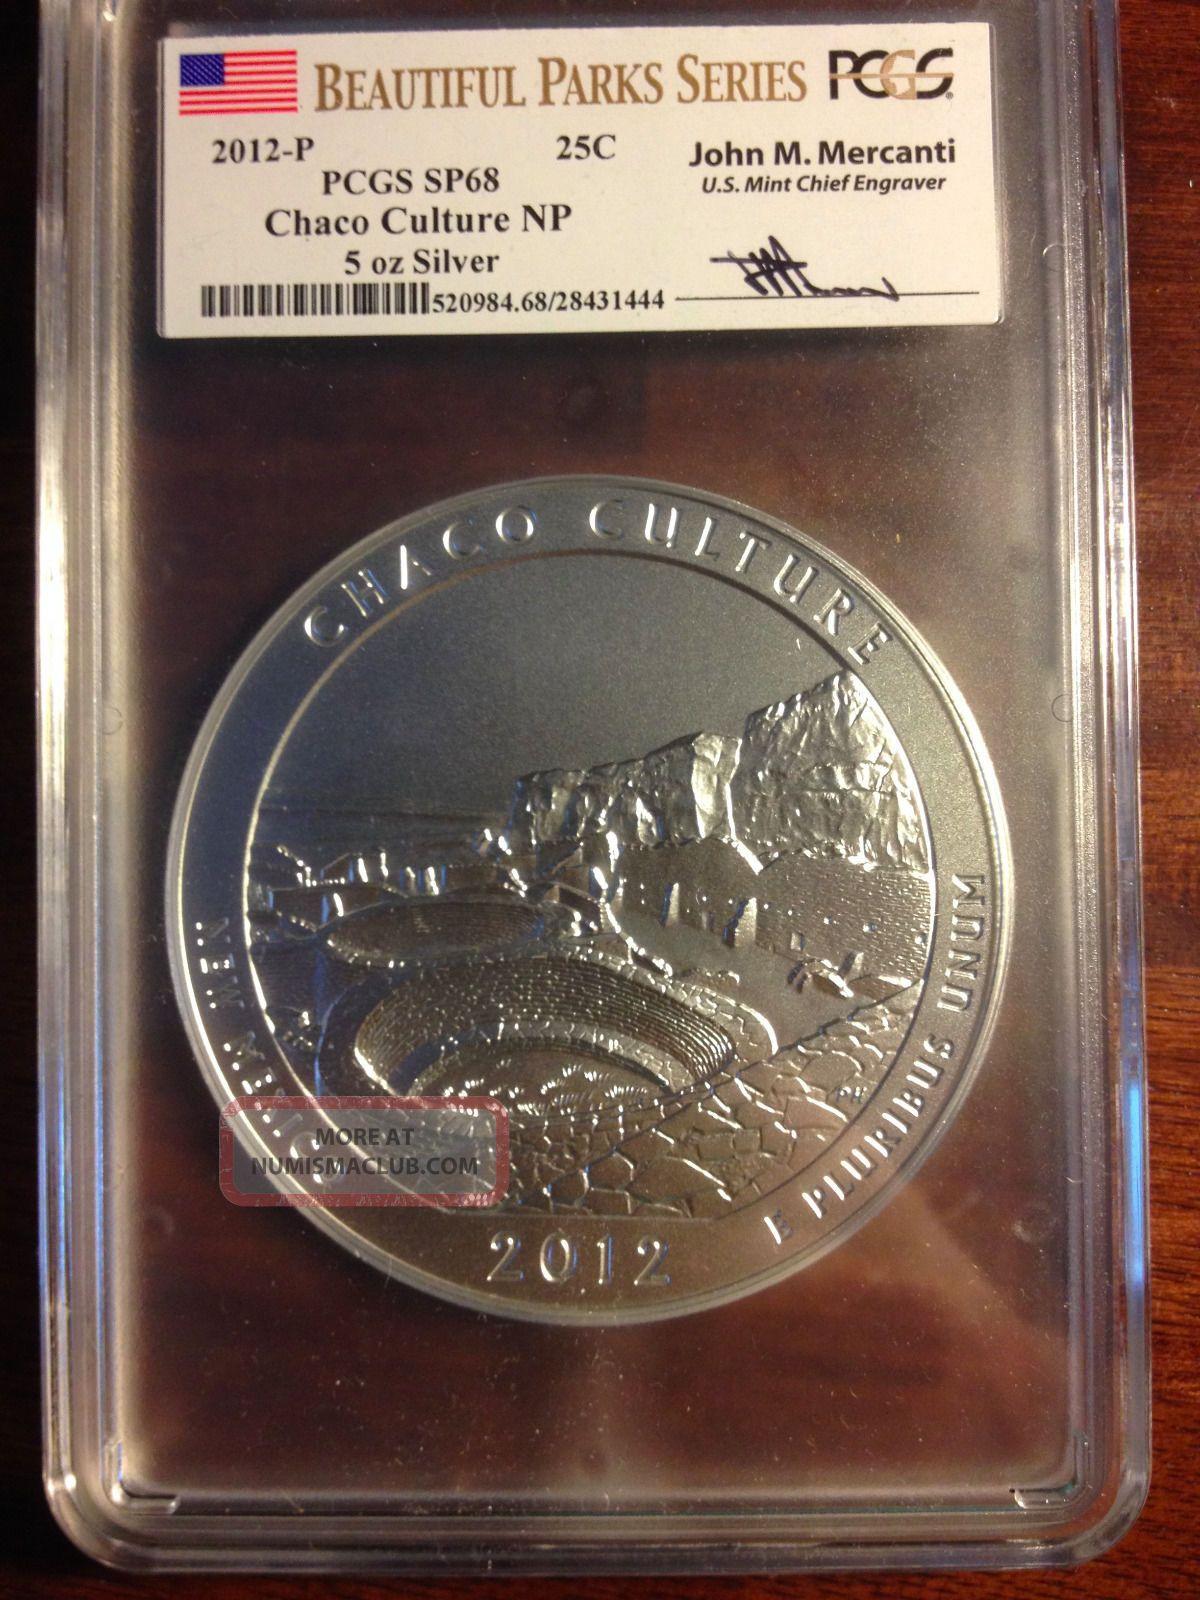 2012 - P Chaco Culture Np 5 Oz Silver Pcgs Sp68 Mercanti Signature Silver photo